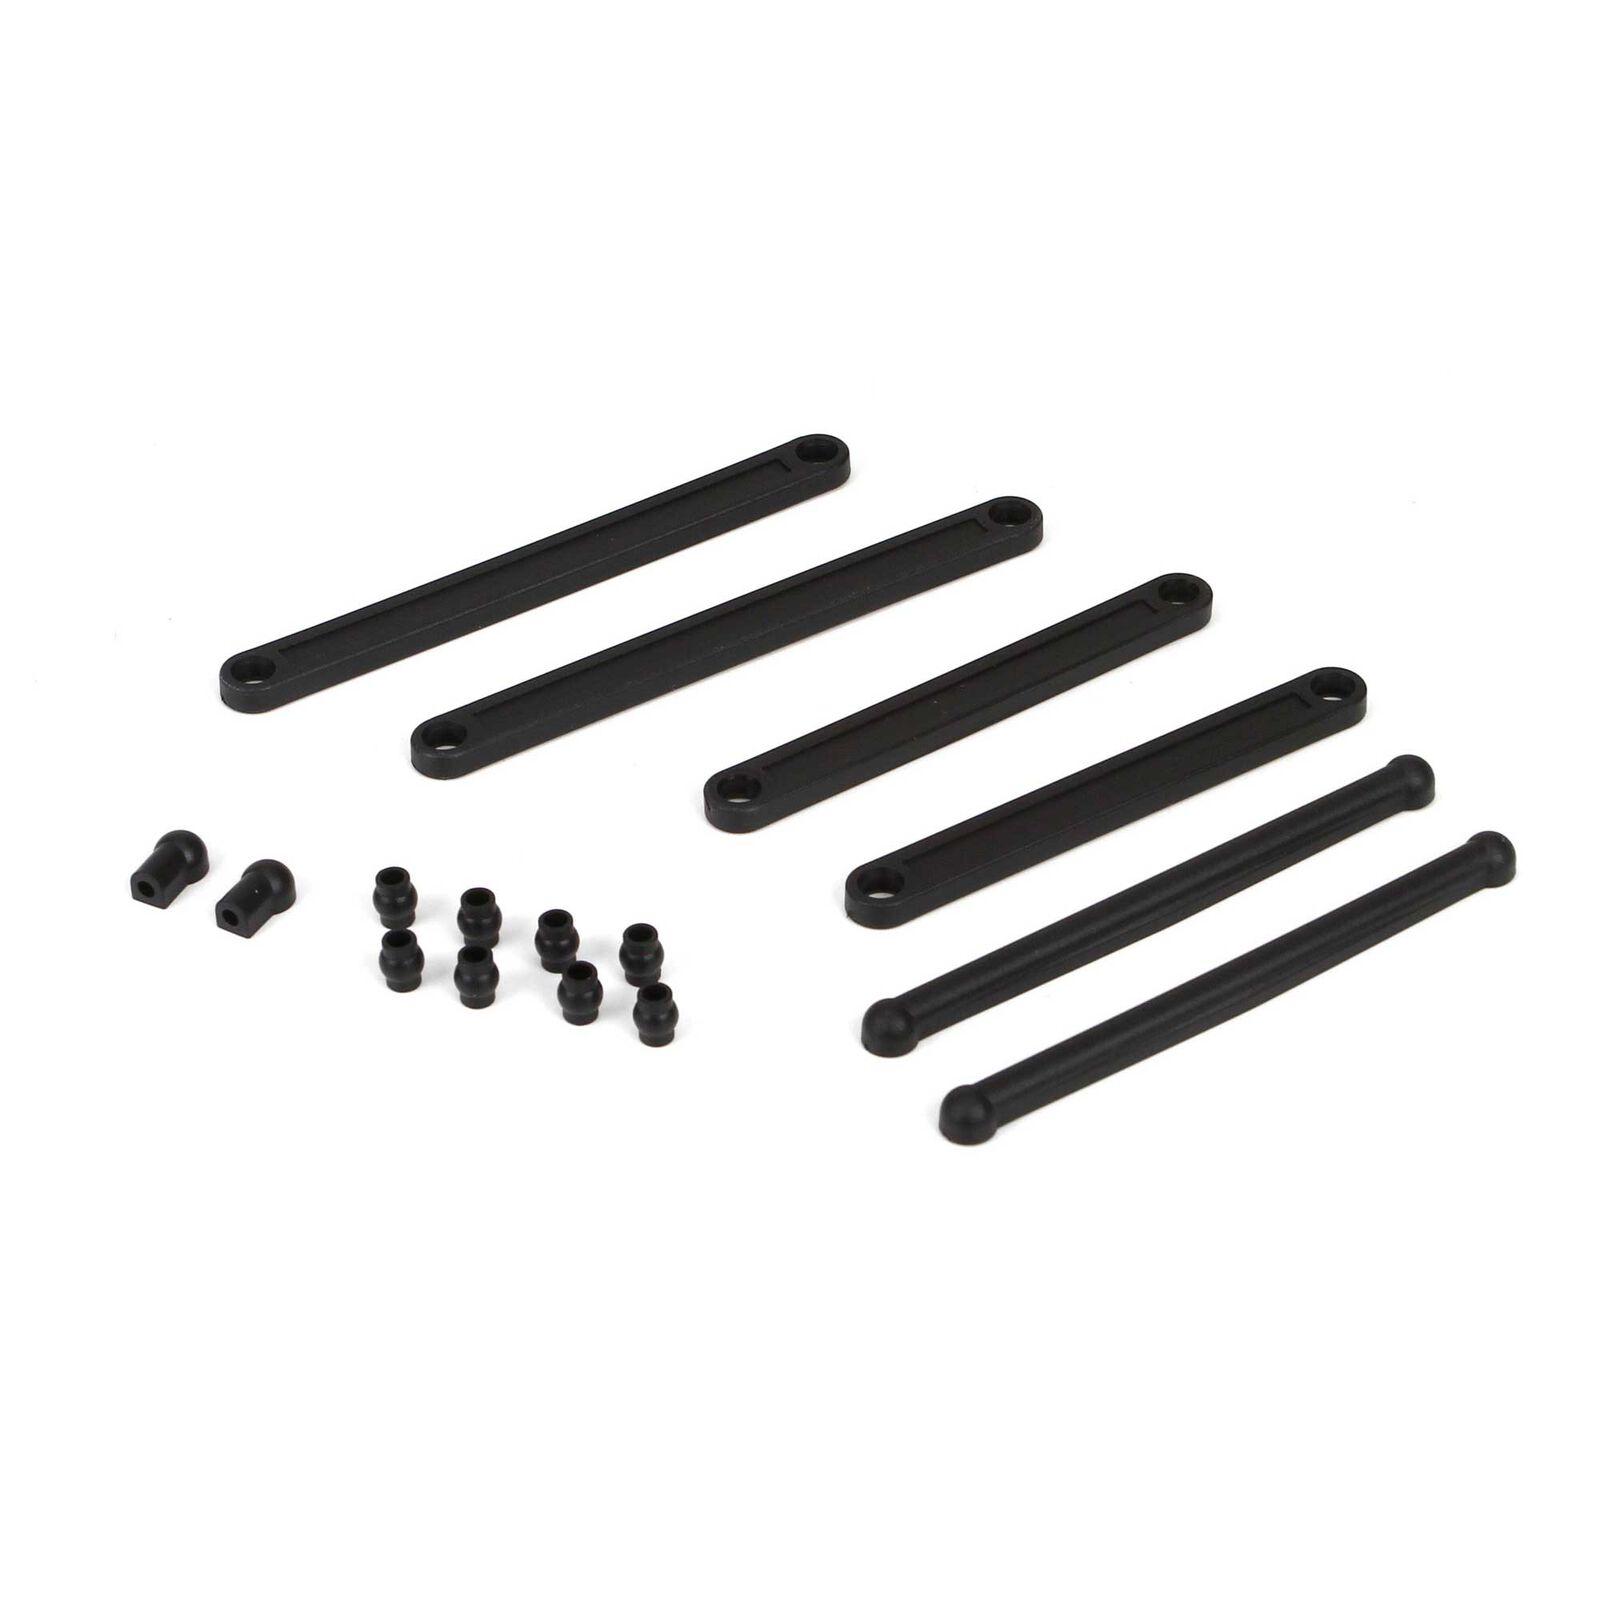 Link Set, Plastic: 1/10 2WD Circuit, Ruckus, Torment